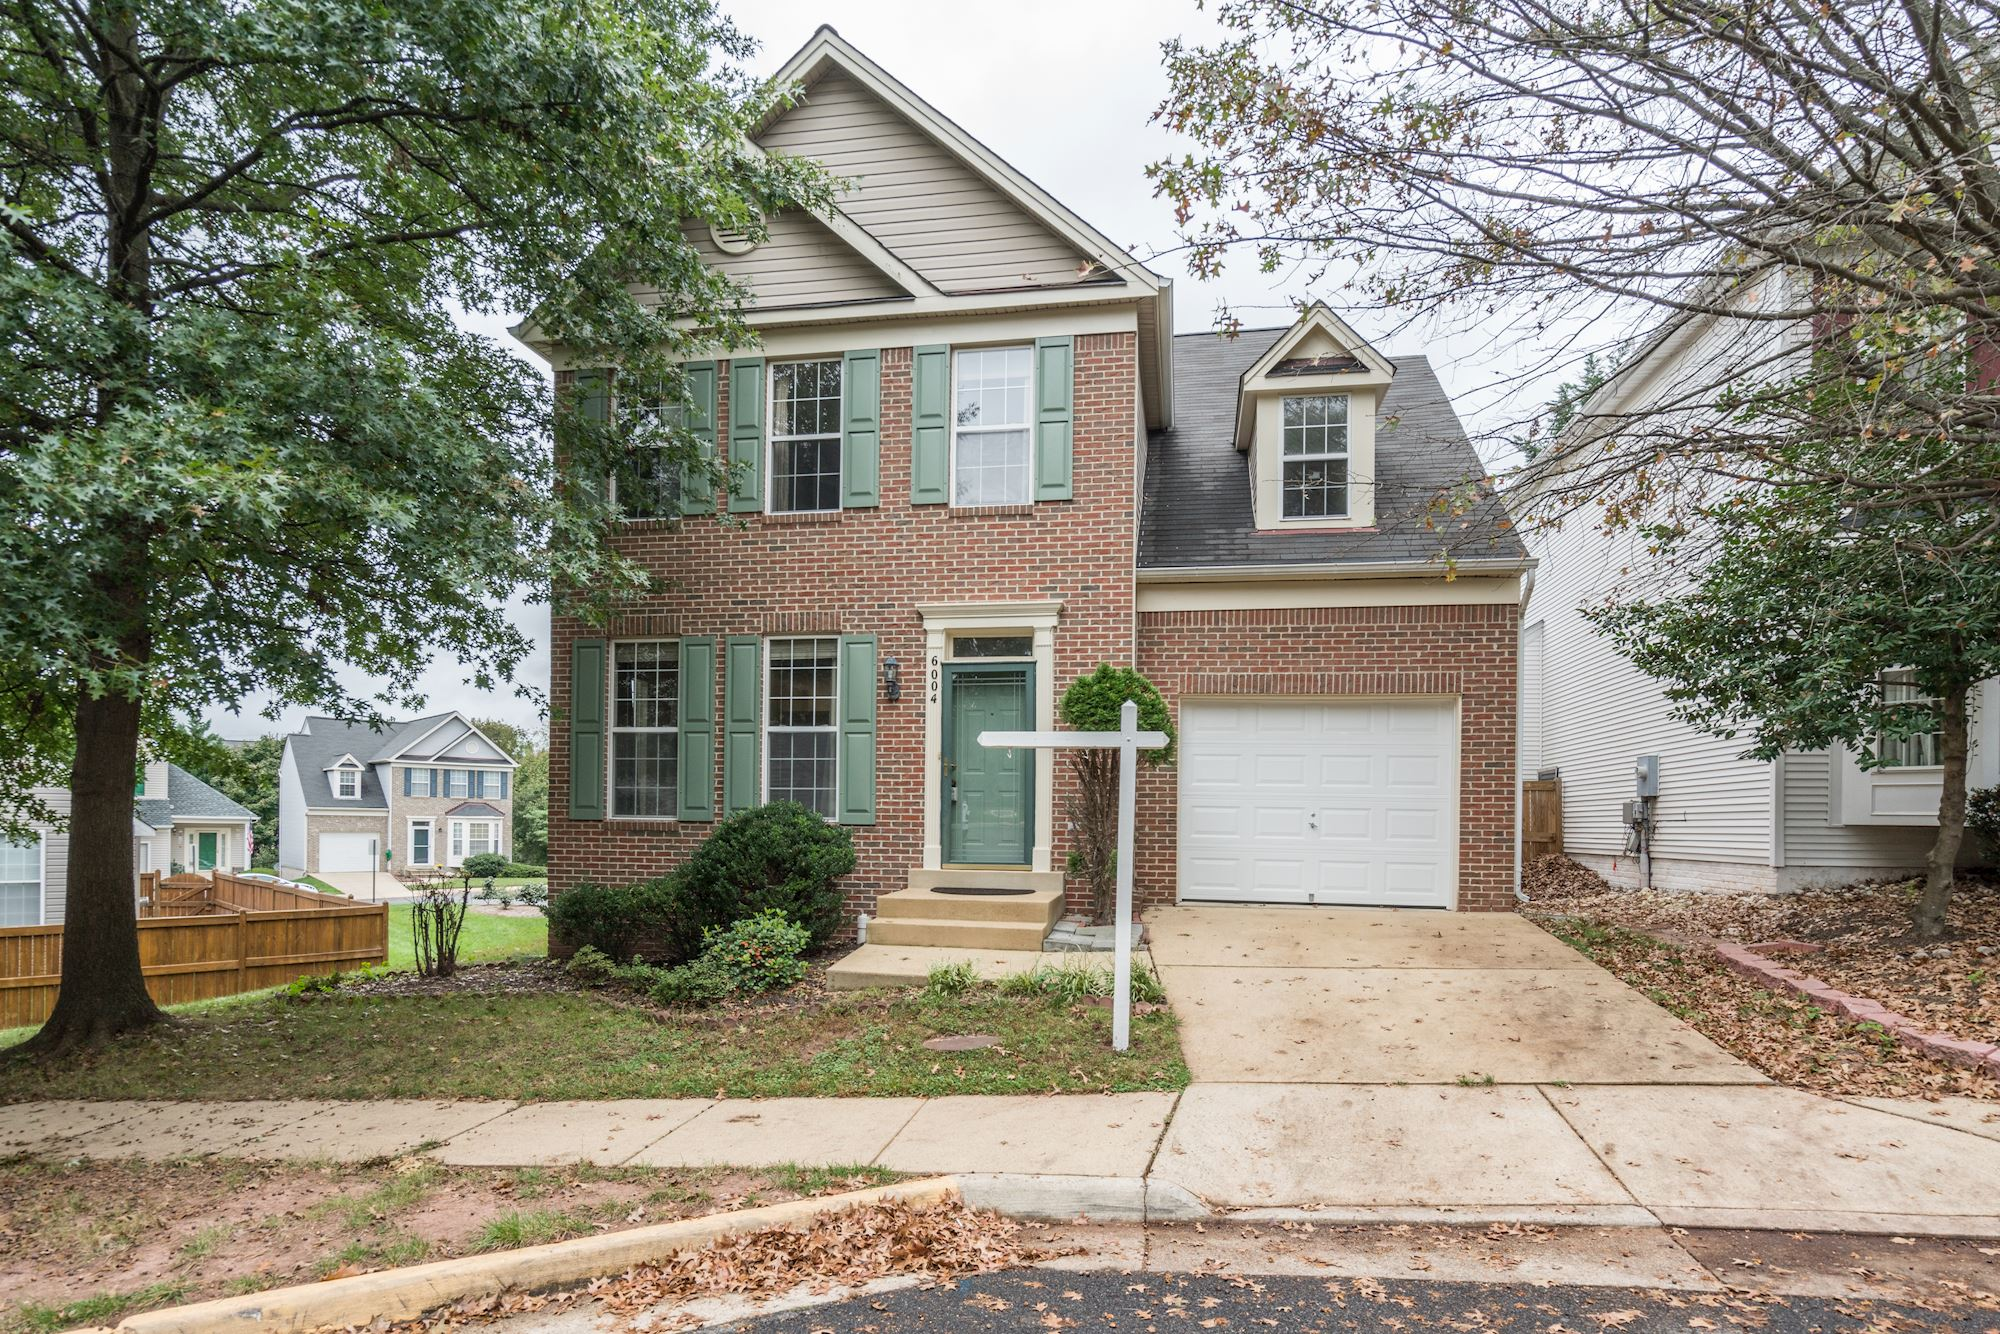 NEW LISTING: 3 BD Centreville Single Family Home on Corner Lot